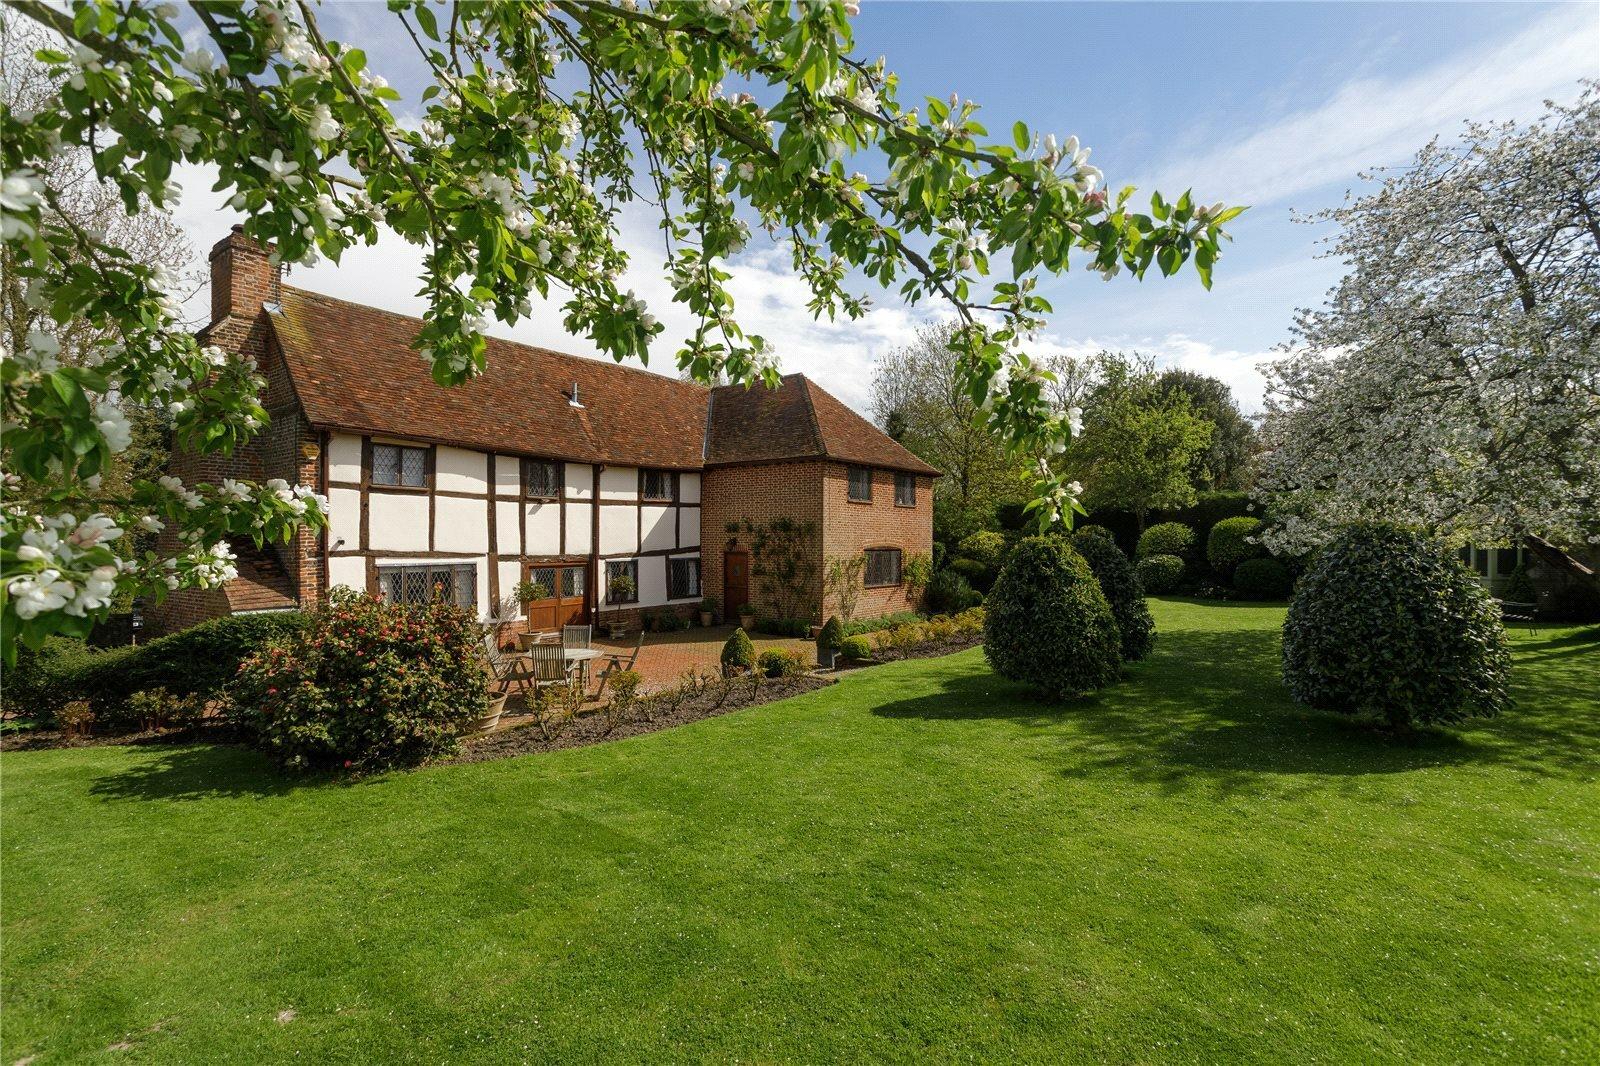 House in Faversham, England, United Kingdom 1